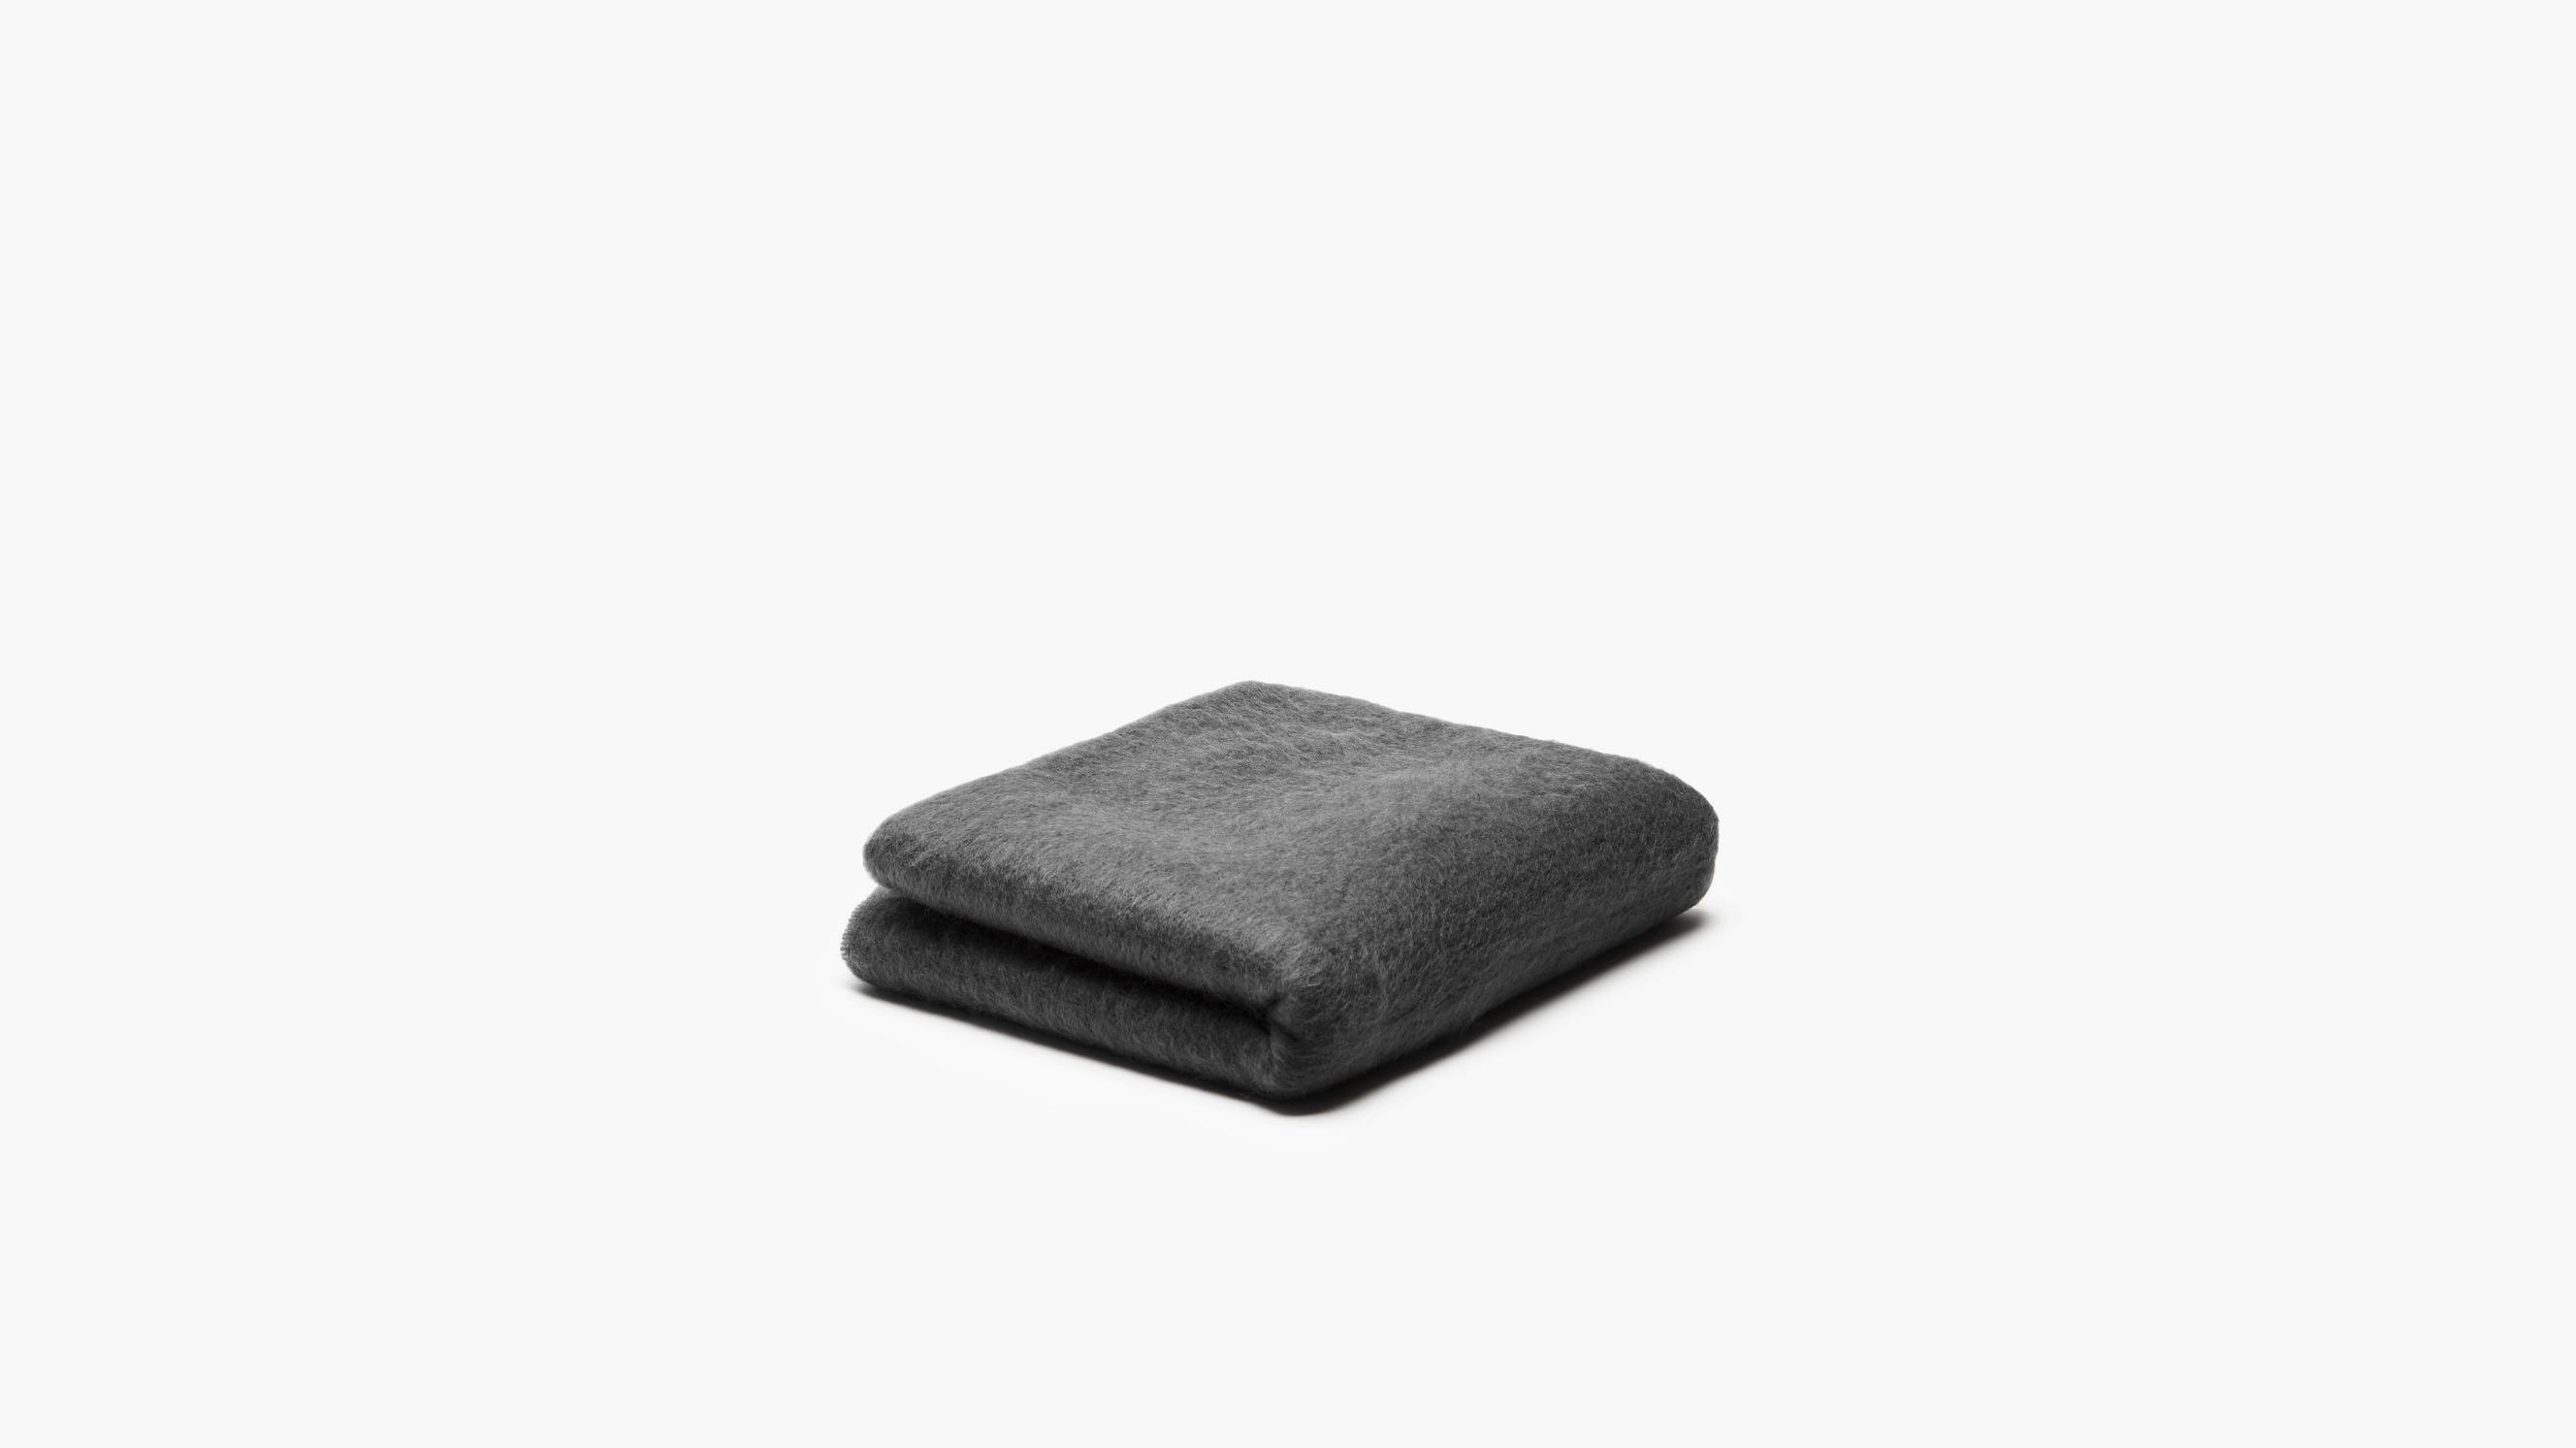 wool anniversary gift throw blanket black gray